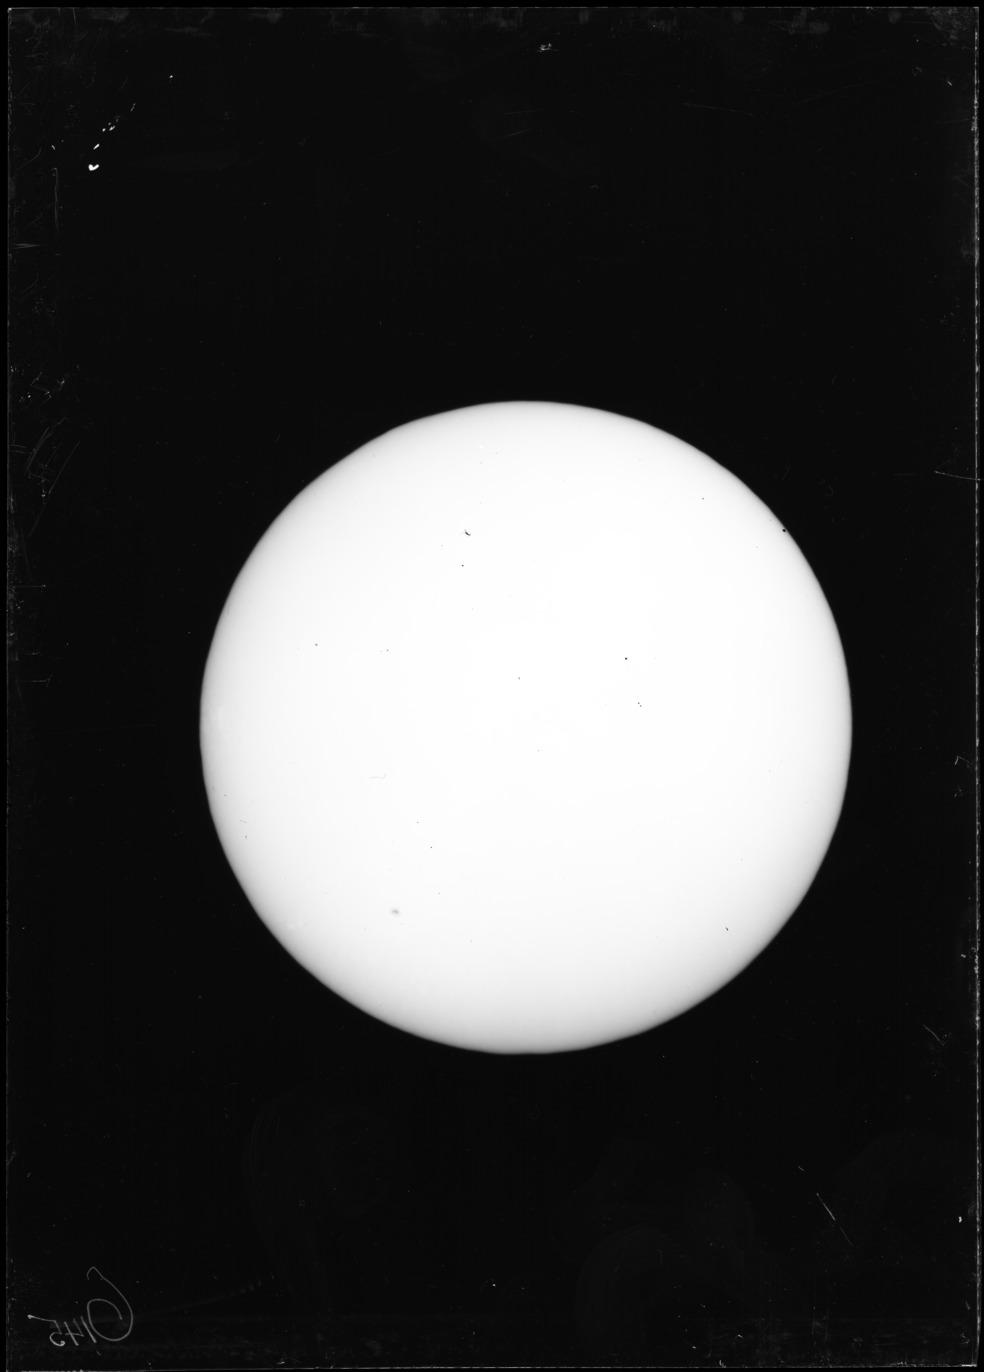 AGlV145